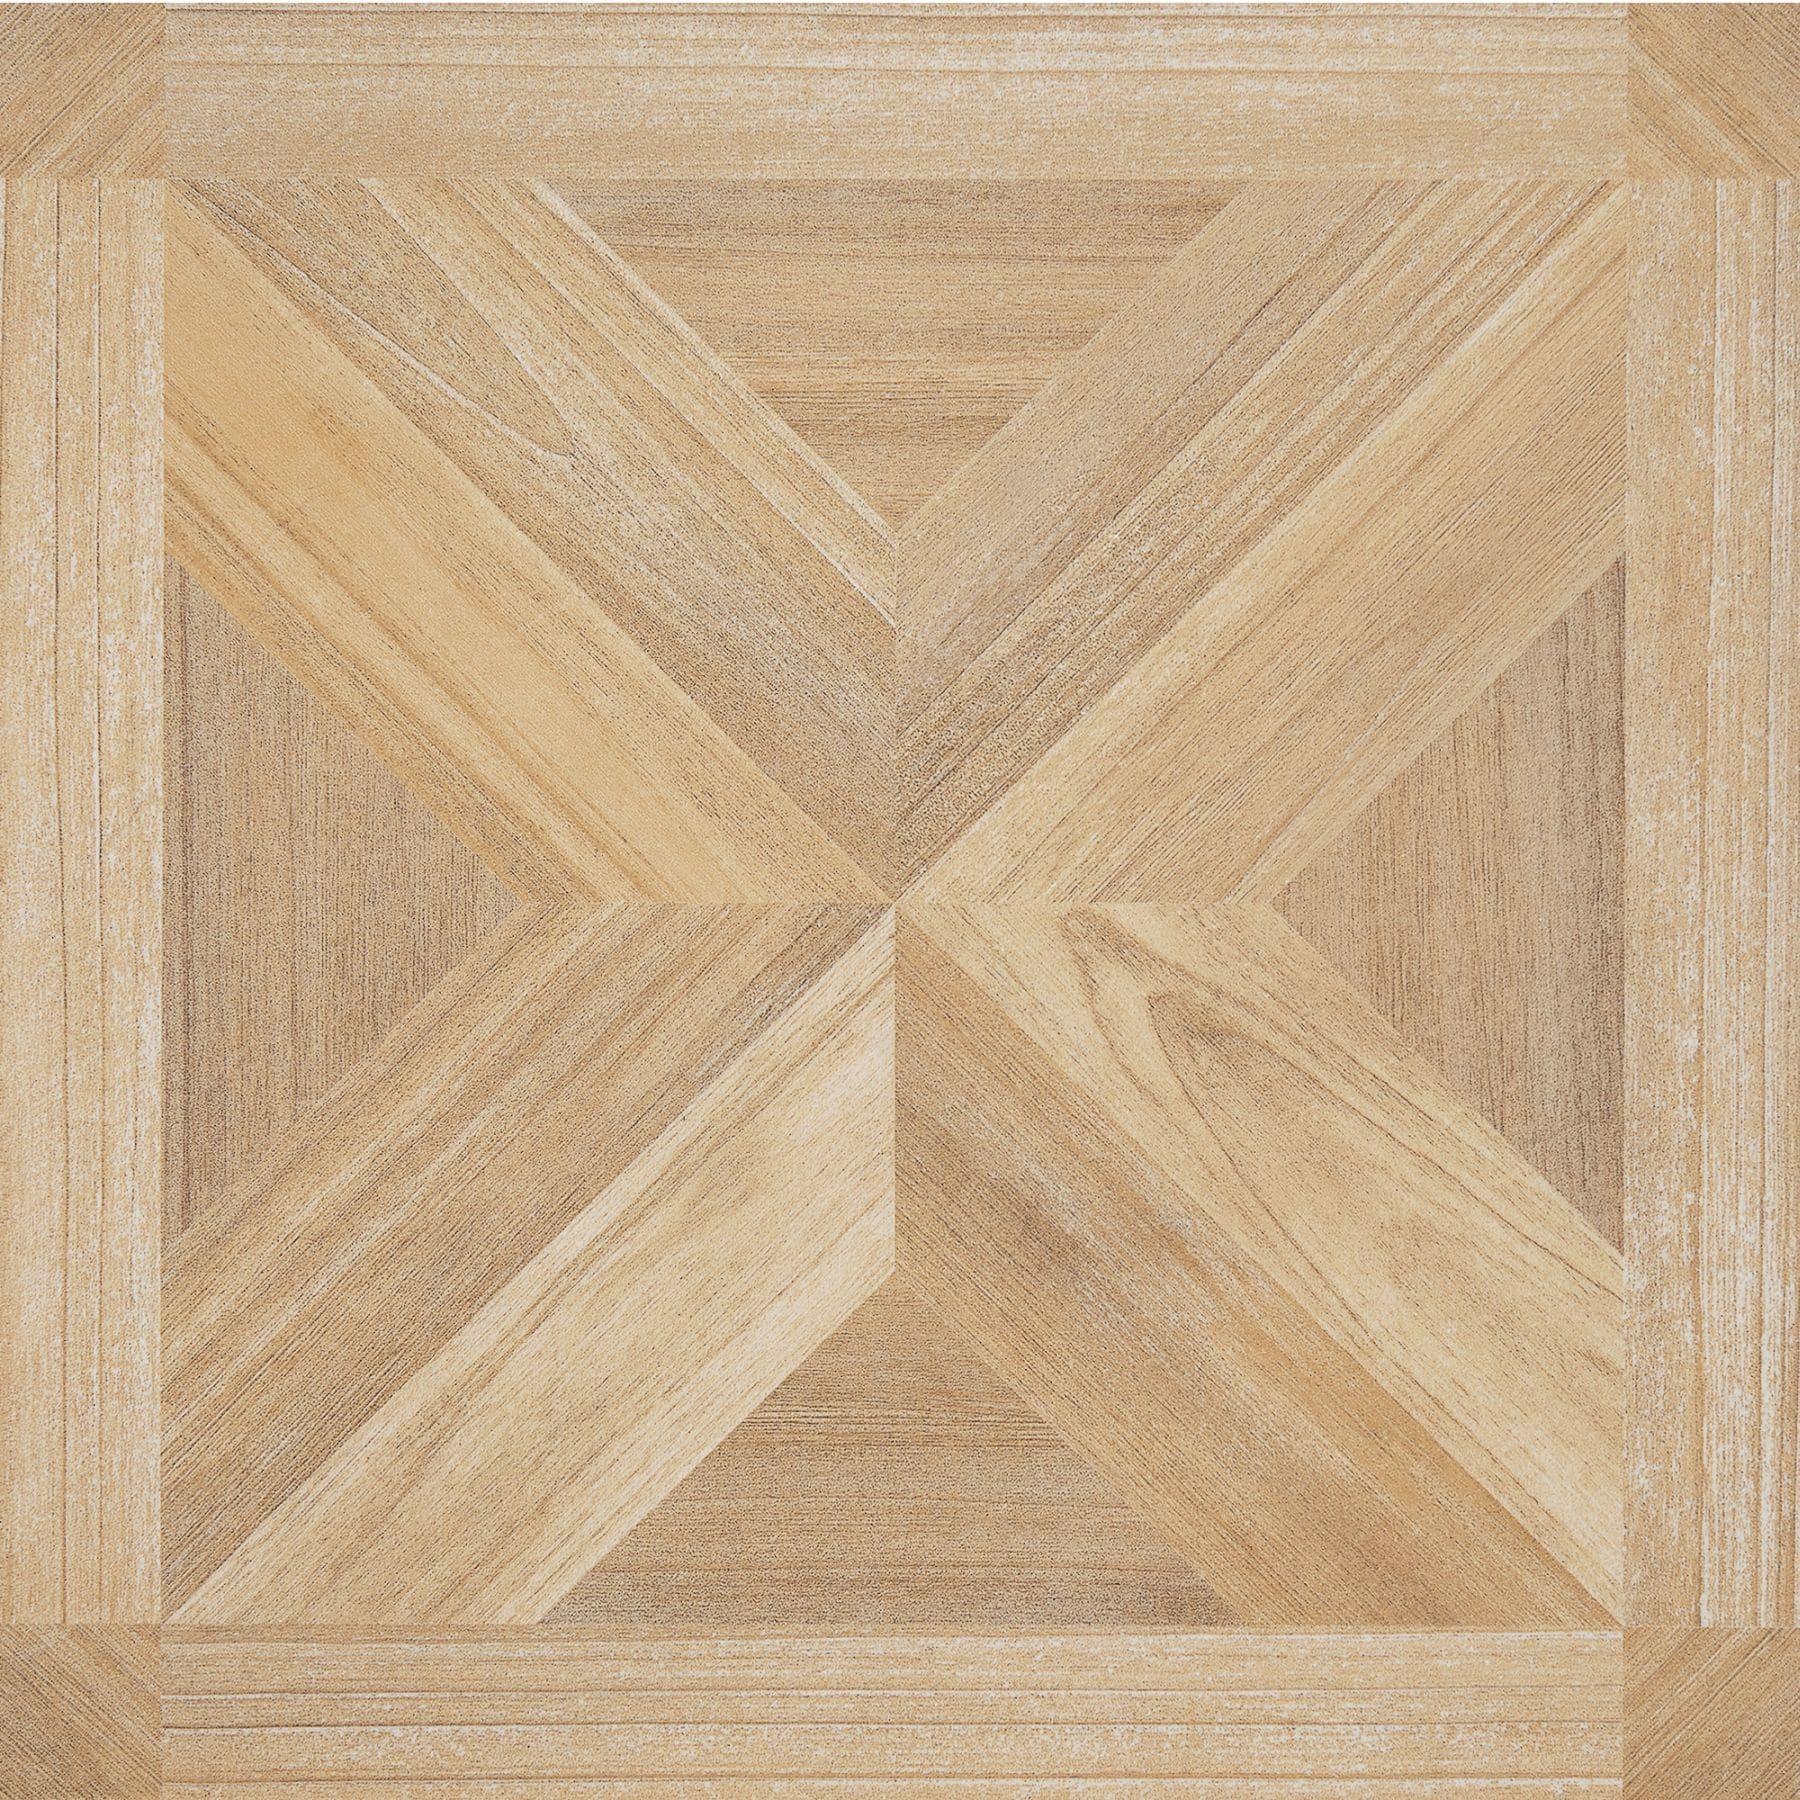 Shop Achim Nexus Maple X Parquet 12x12 Self Adhesive Vinyl Floor